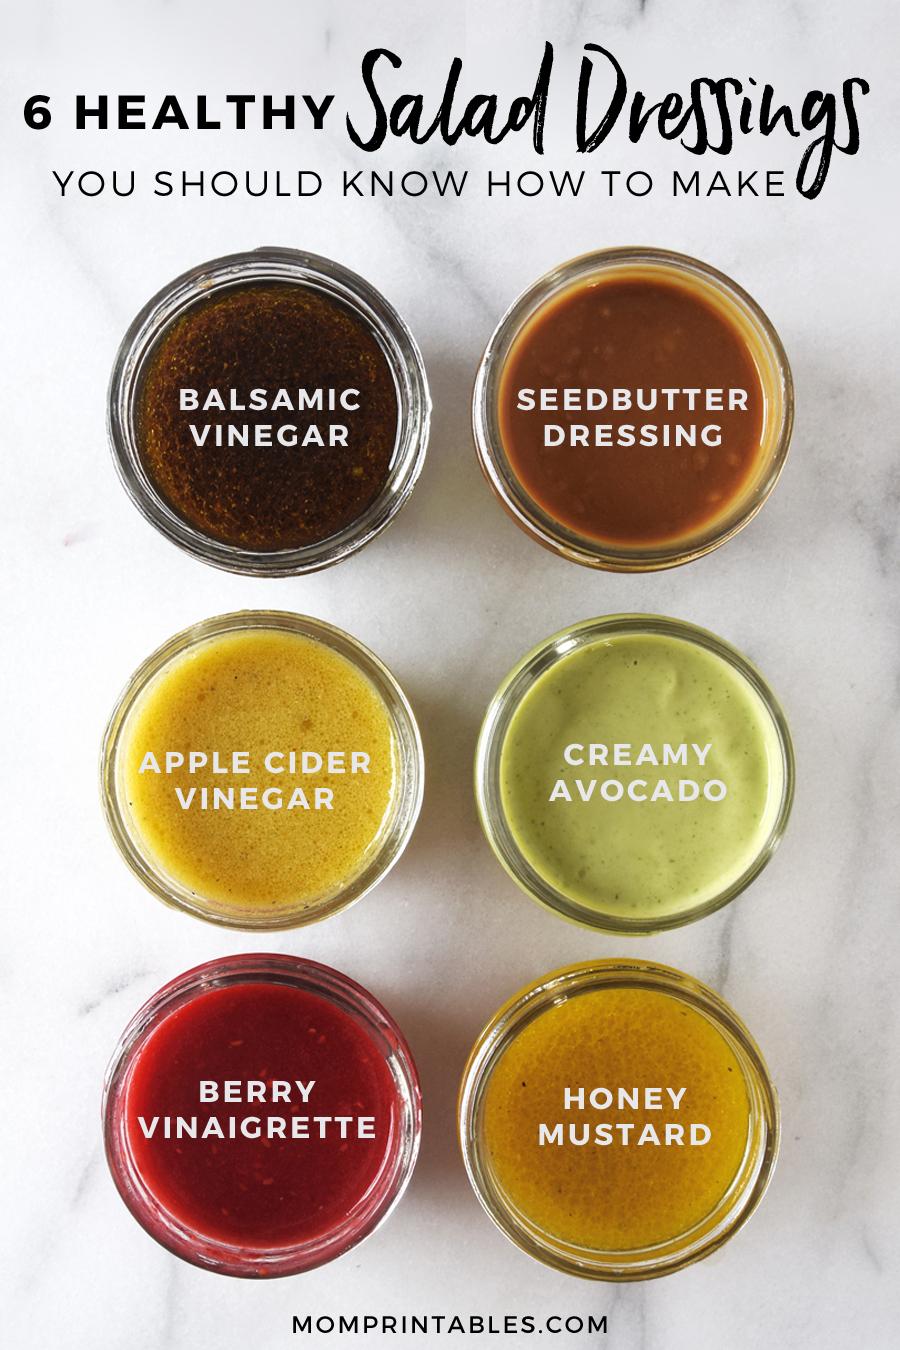 6 Healthy Homemade Salad Dressing Recipes. Balsamic vinegar, seedbutter, apple cider vinegar, creamy avocado, berry vinaigrette, honey mustard dressing.